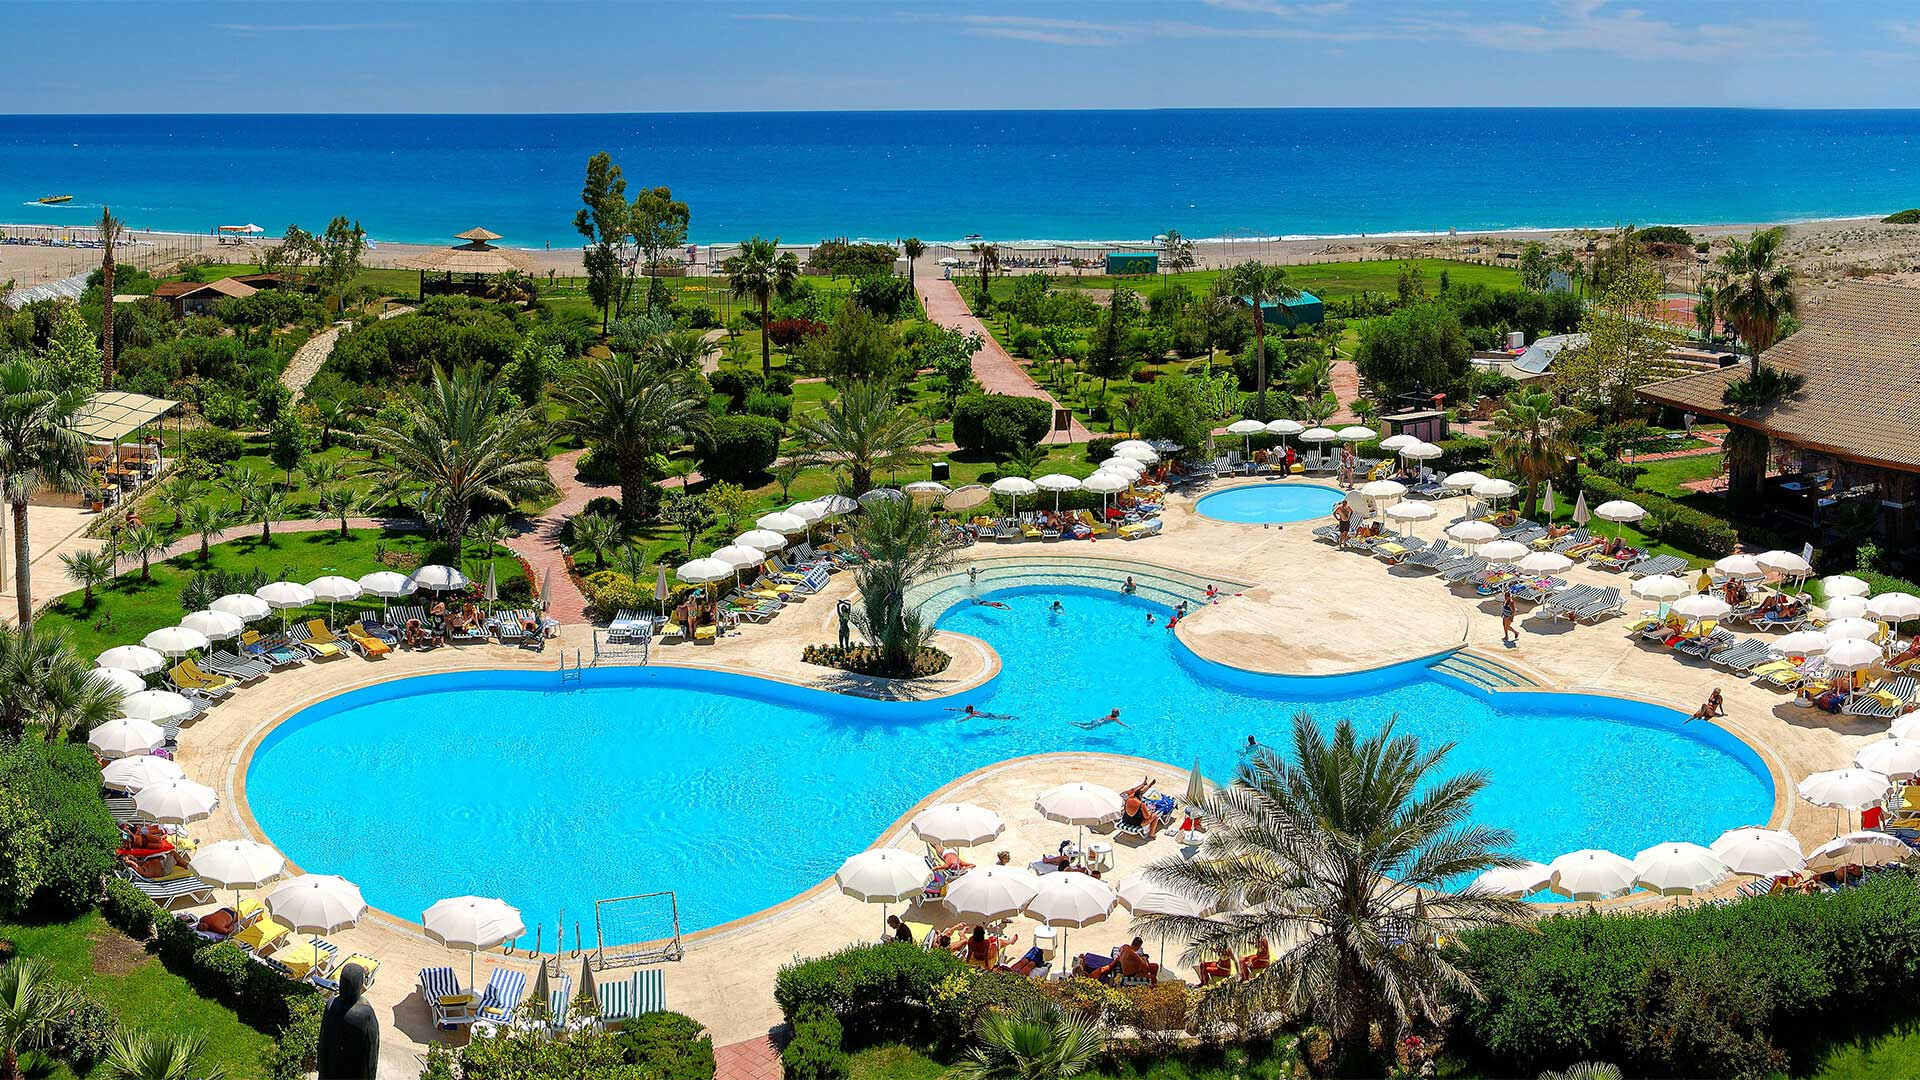 Oferta speciala de la Fibula pentru Antalya